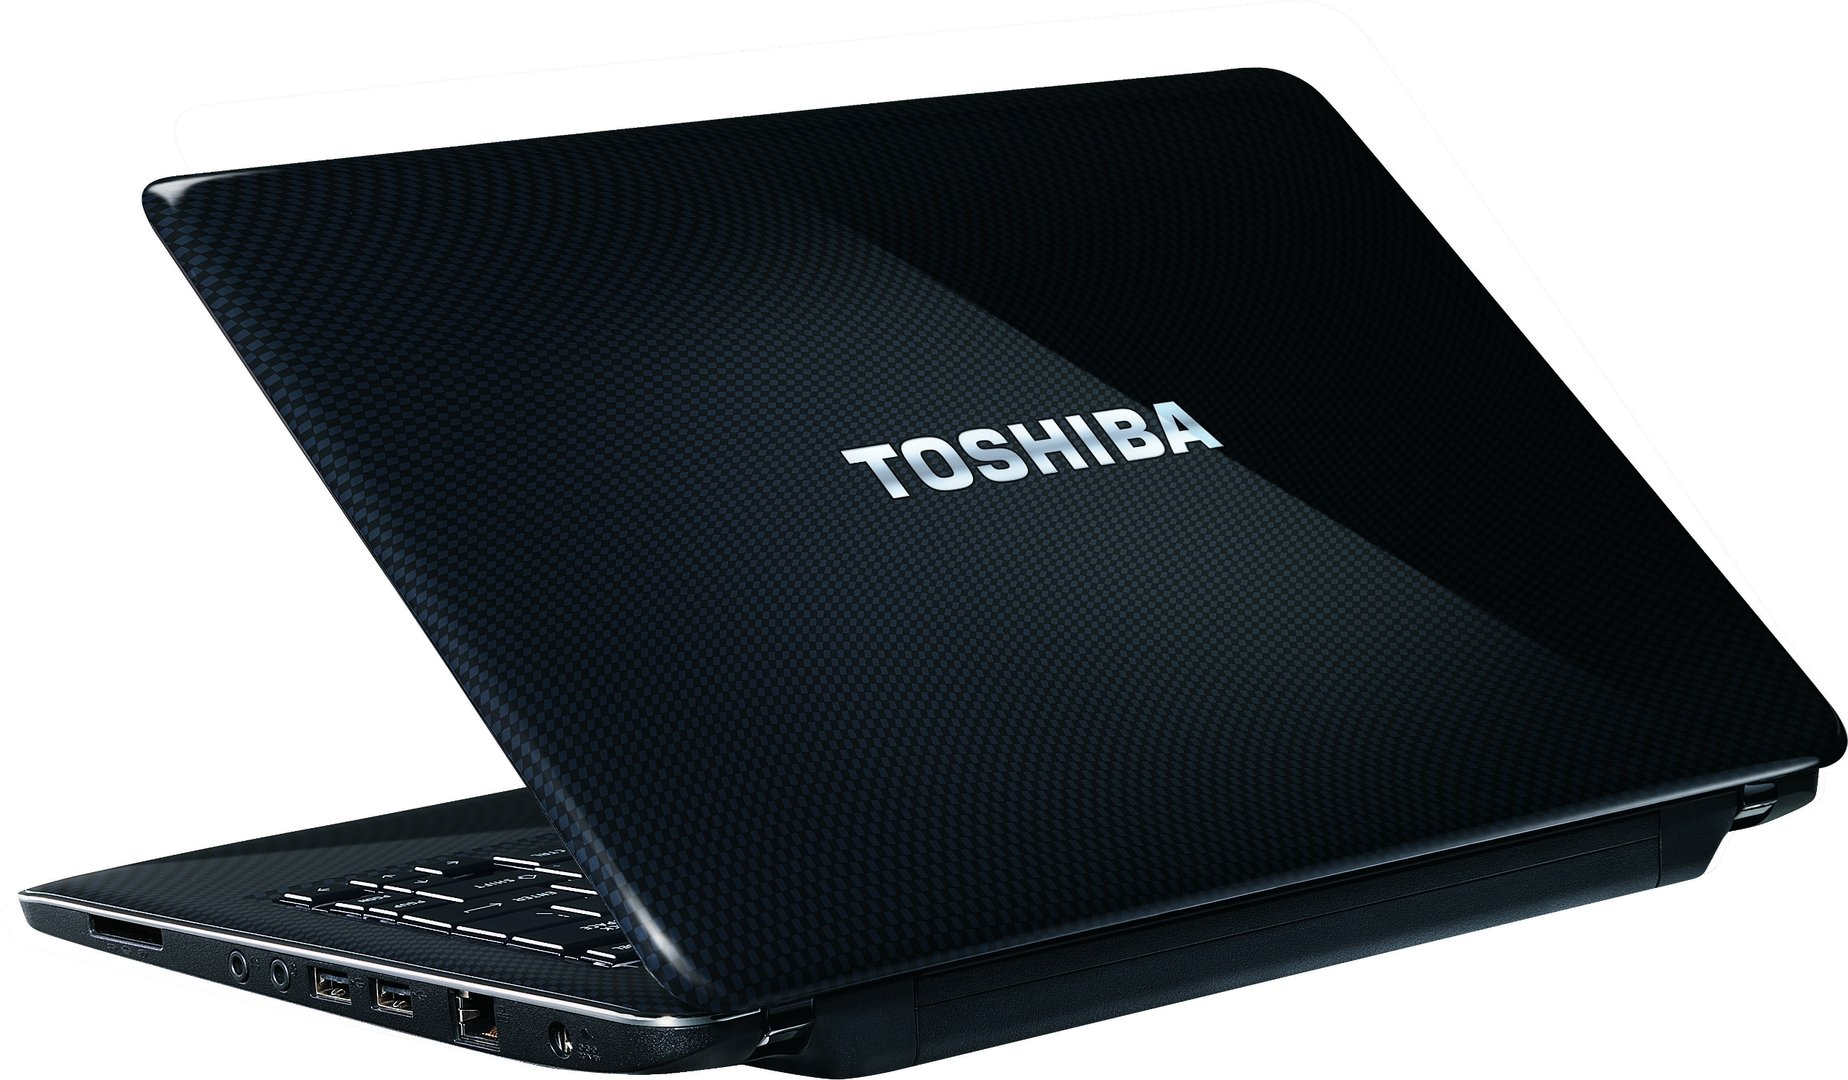 Toshiba Satellite Pro T130-14L